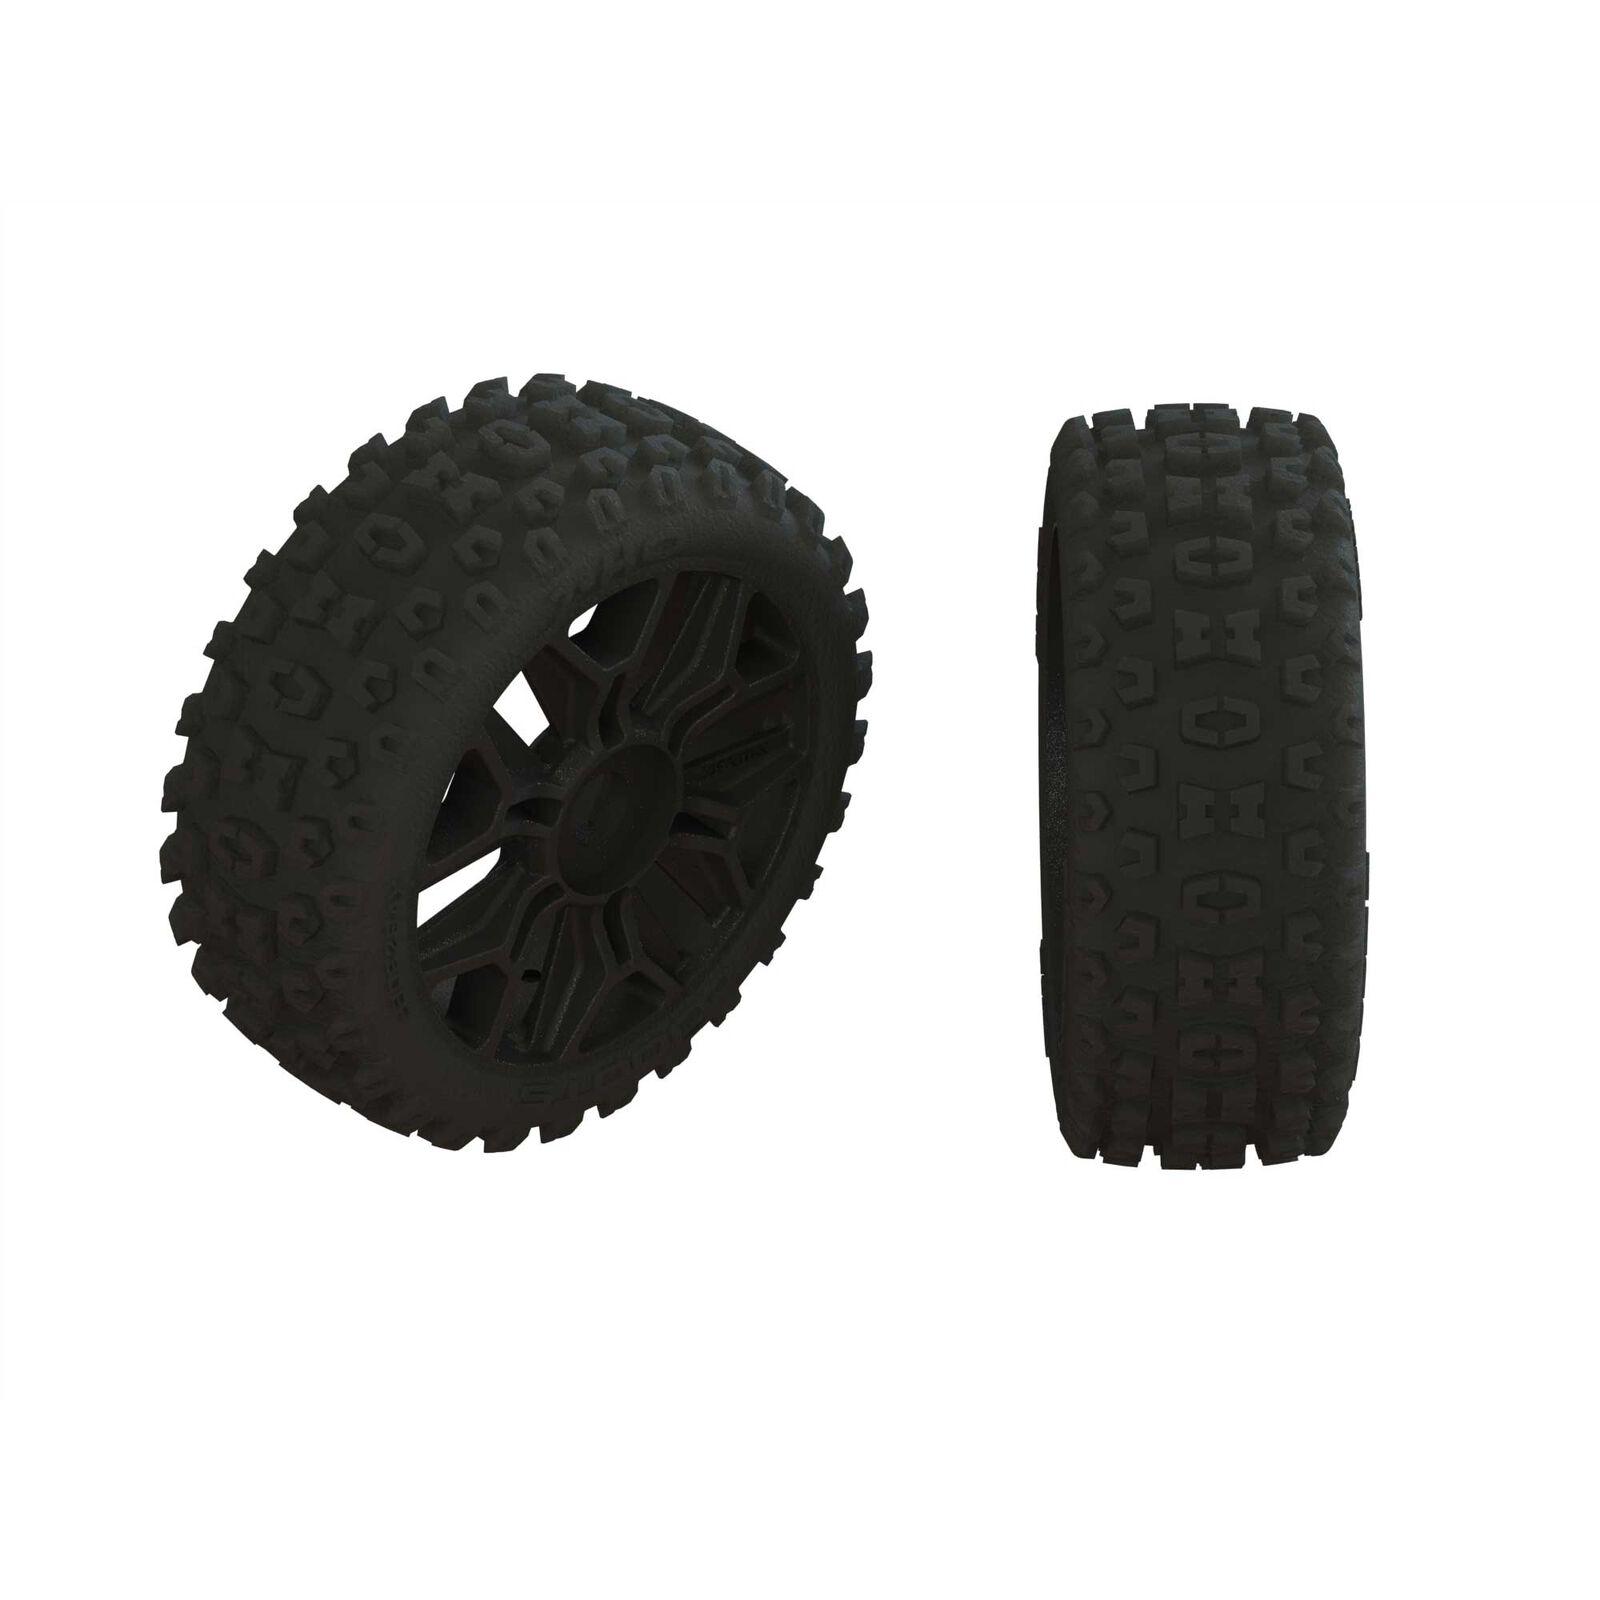 Dboots '2HO' Tire Set Glued Gun Metal (2)